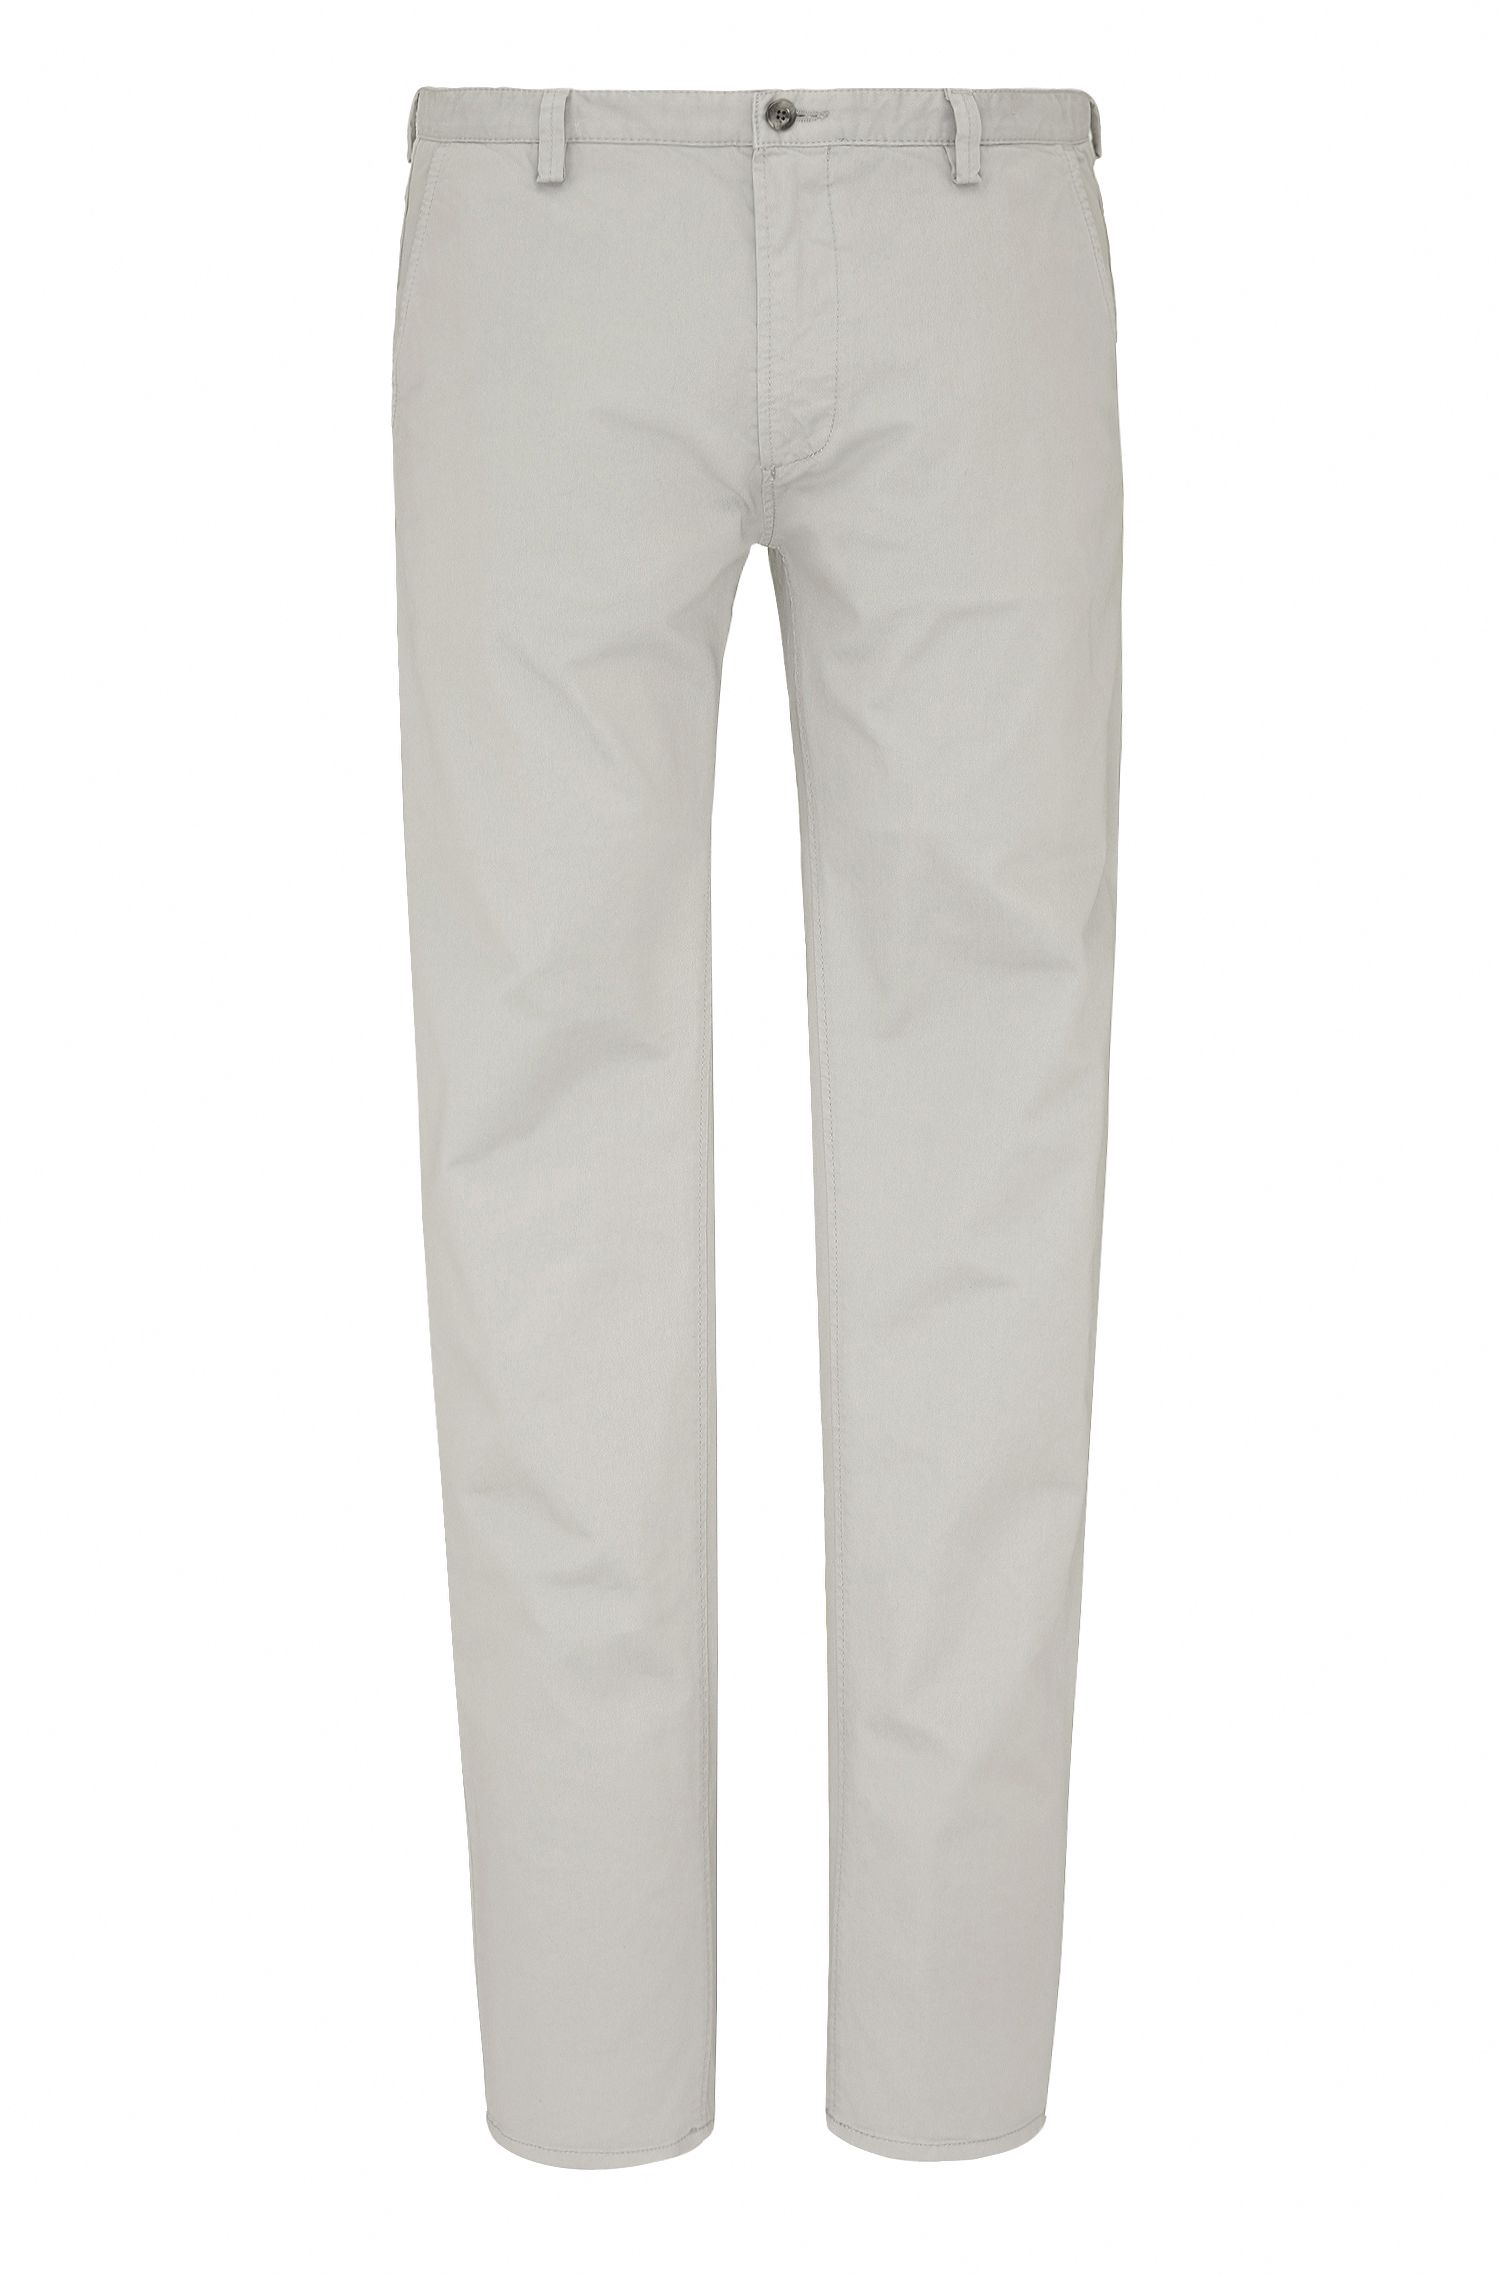 Pantaloni slim fit in gabardine elasticizzata